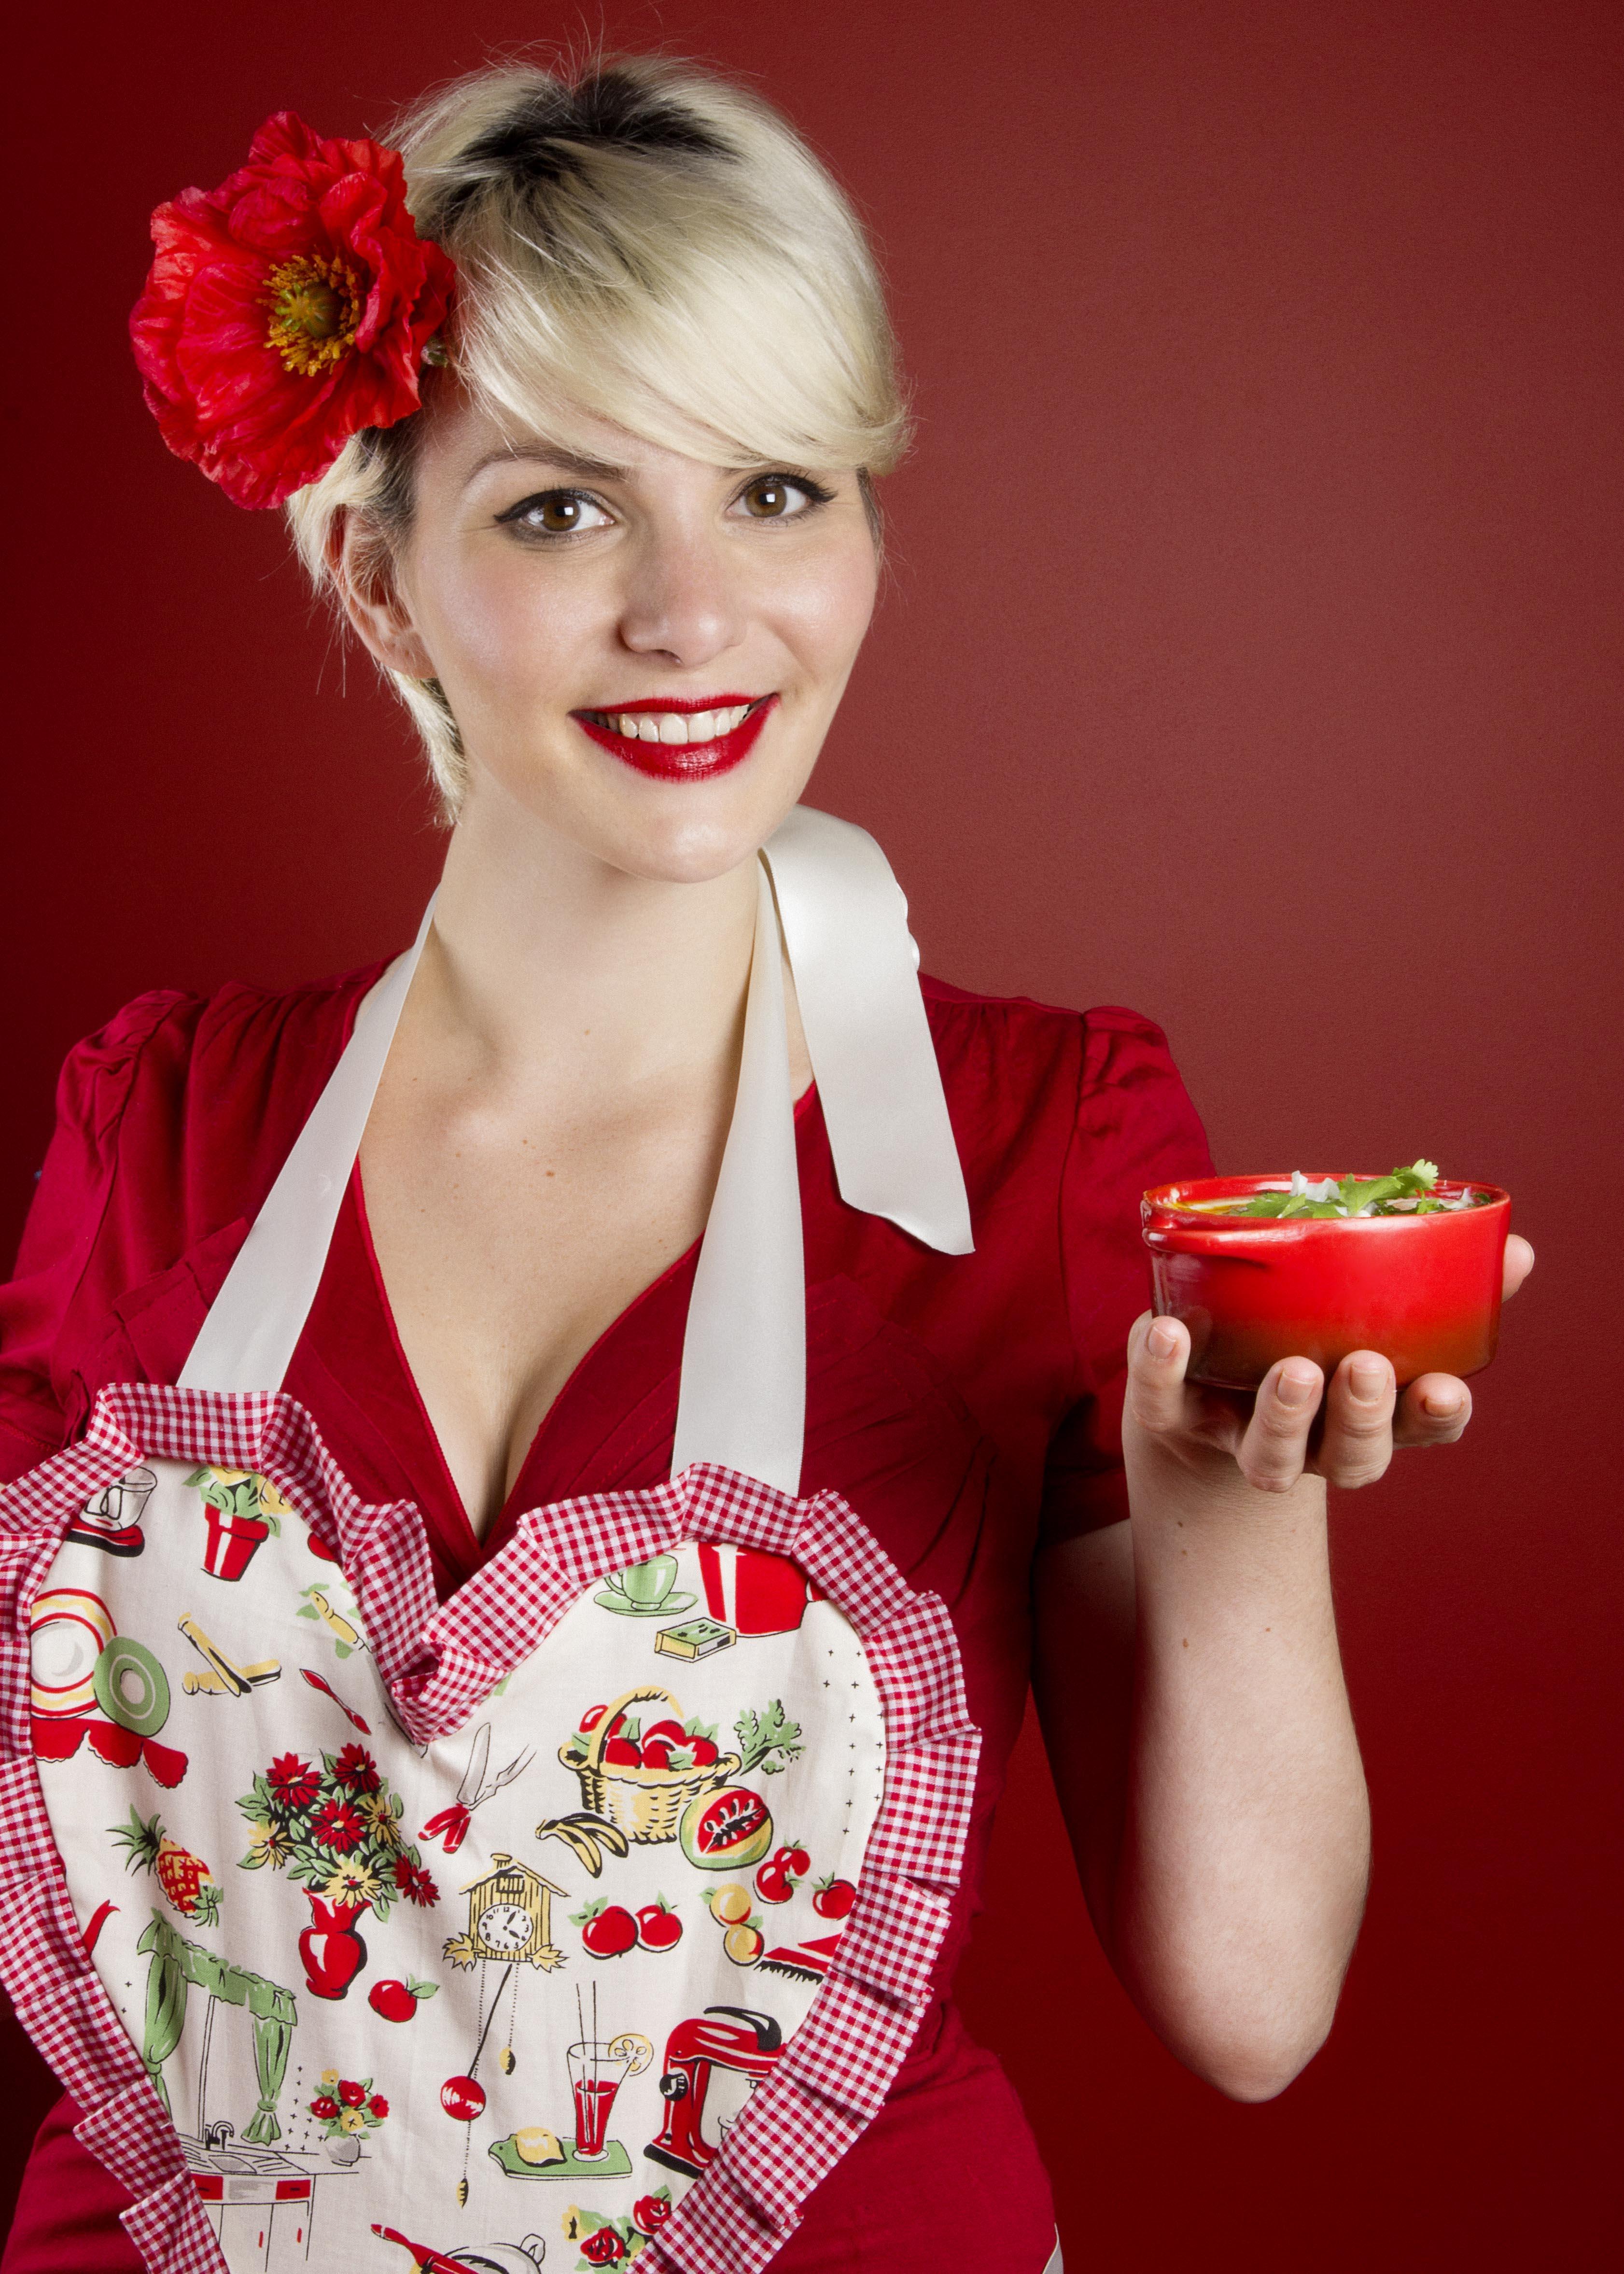 lapinupalacasserole1   Cuisiner sans gluten